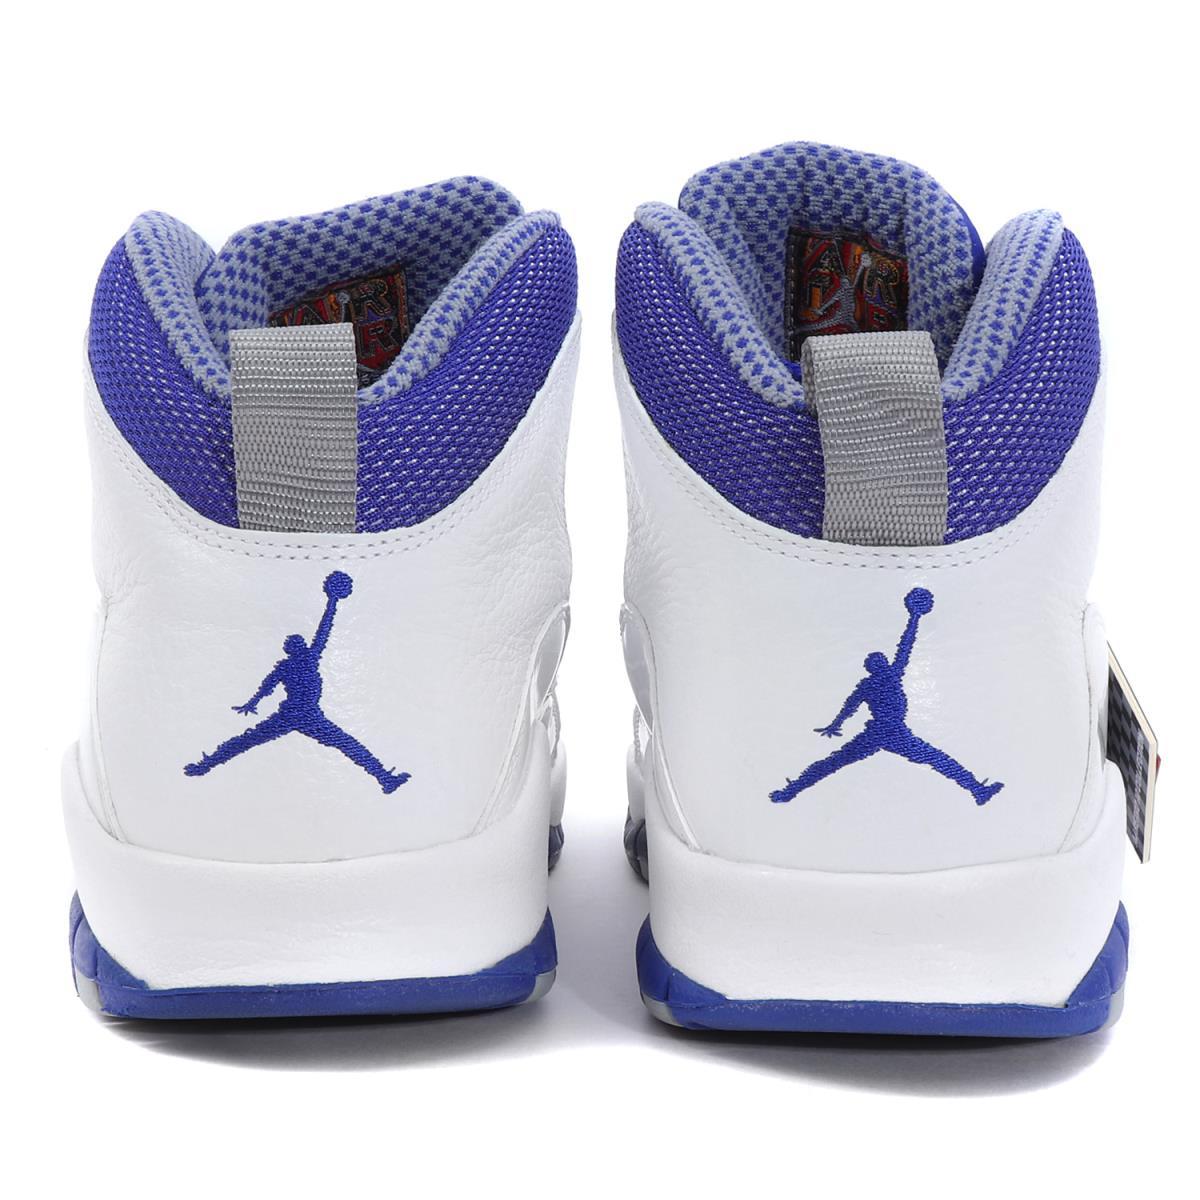 premium selection 6aac6 7c3e2 NIKE (Nike) AIR JORDAN 10 RETRO TXT (487,214-107) white X old royal